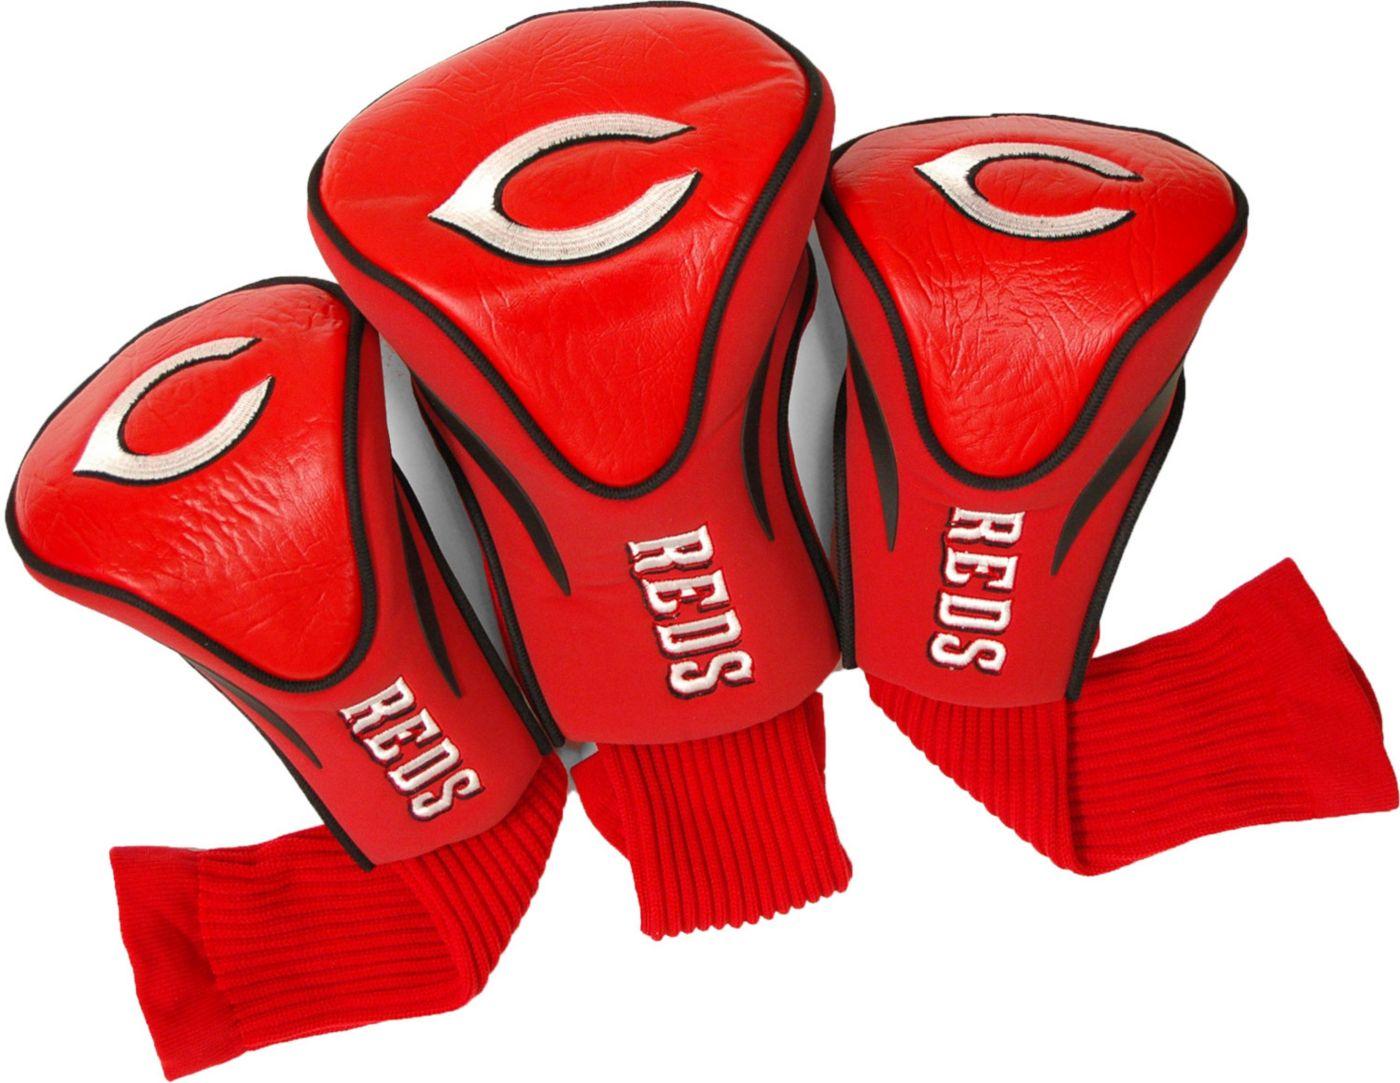 Team Golf Cincinnati Reds Contour Sock Headcovers - 3 Pack